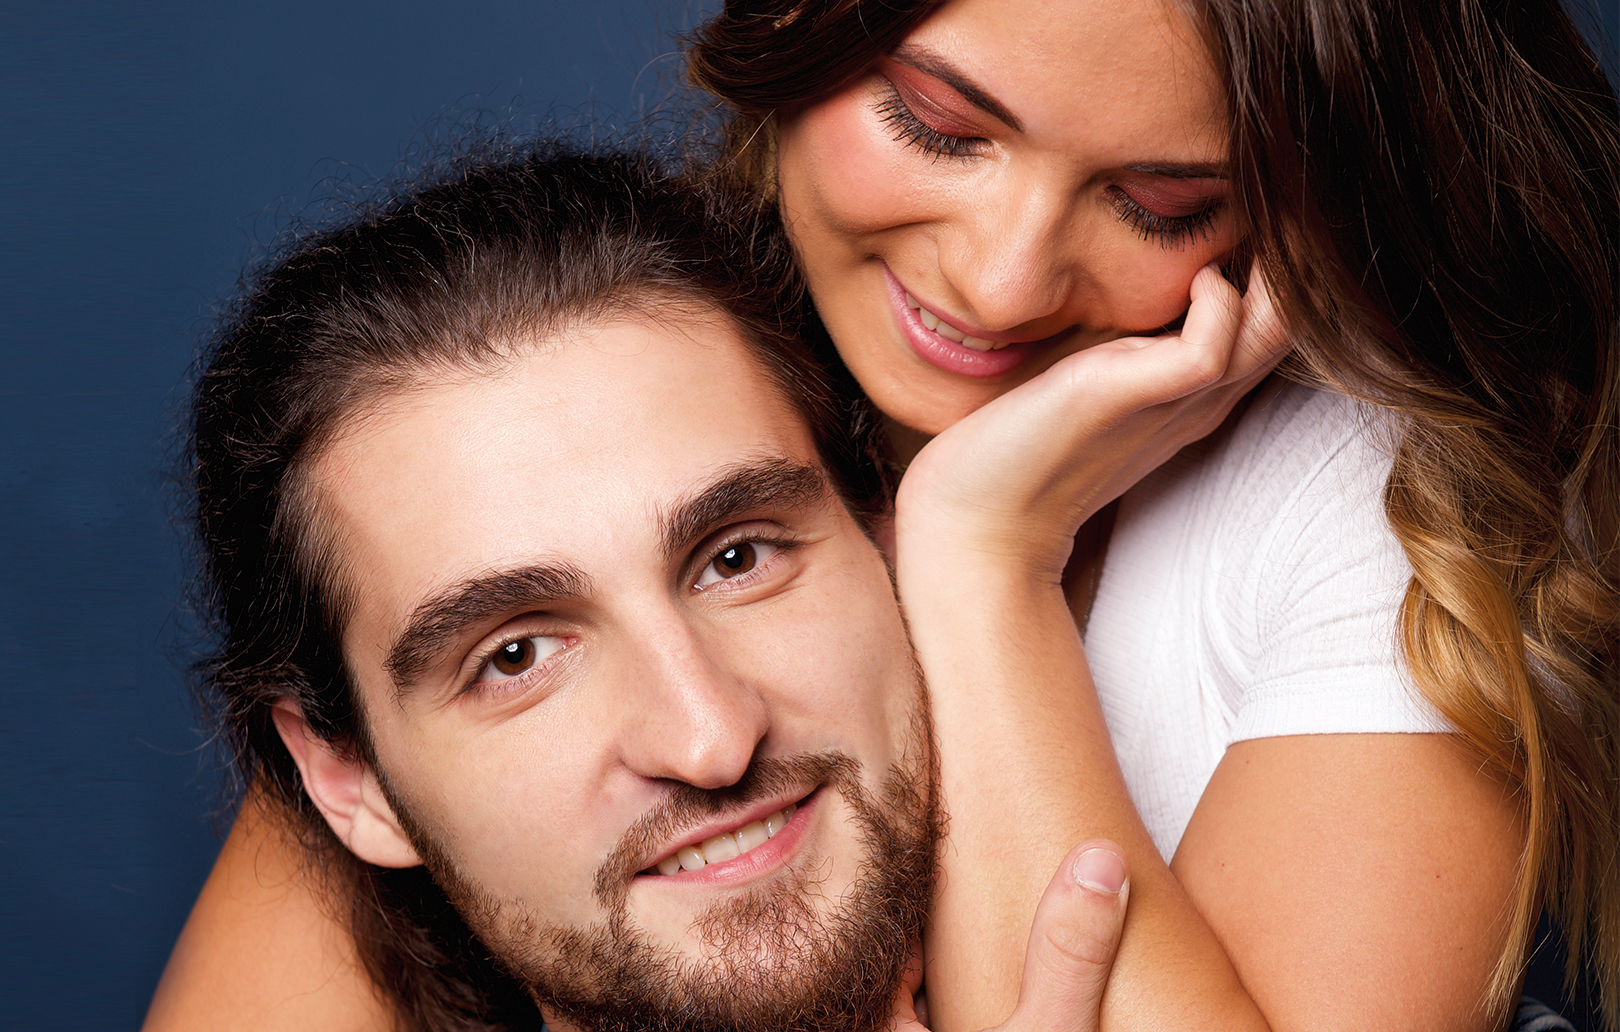 partner-fotoshooting-koeln-bg21617894168